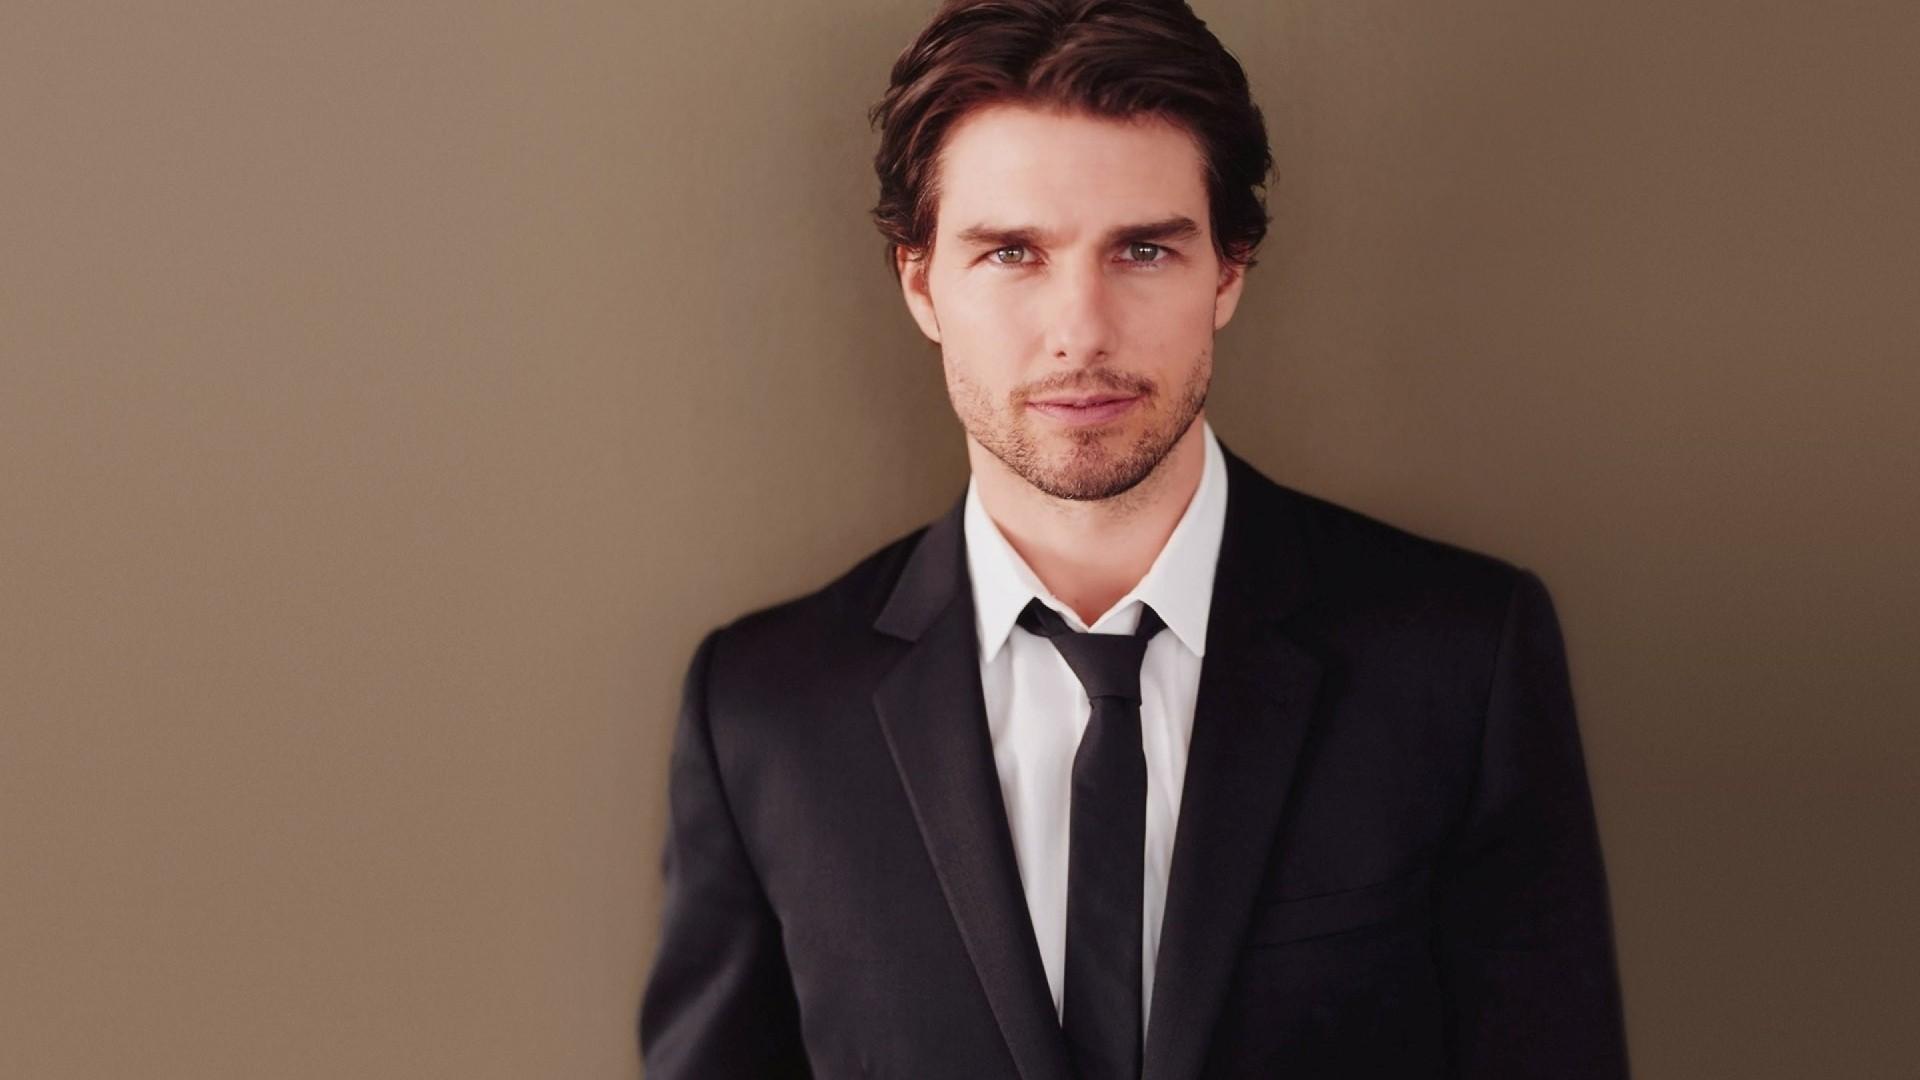 Tom Cruise Wallpaper